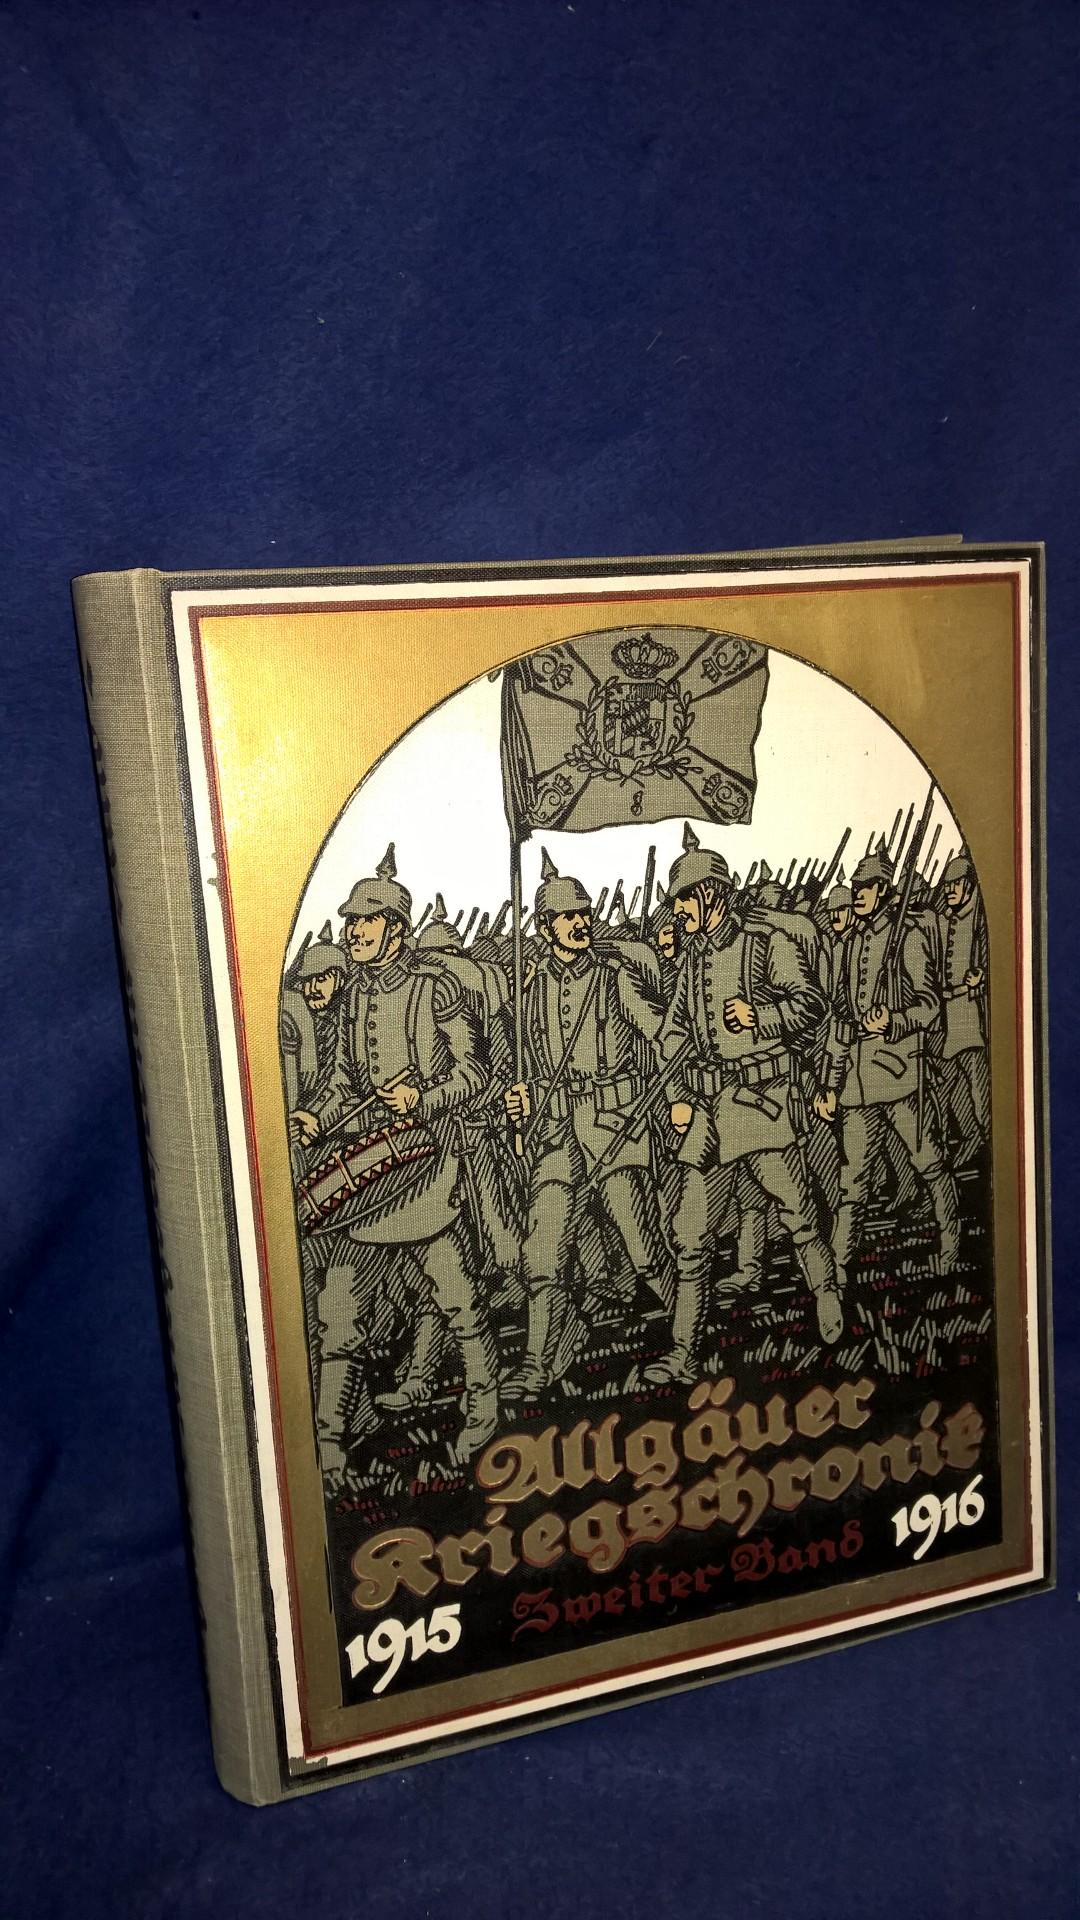 Allgäuer Kriegschronik 1915-1916, 2.Band. ( Lieferung 36-70)